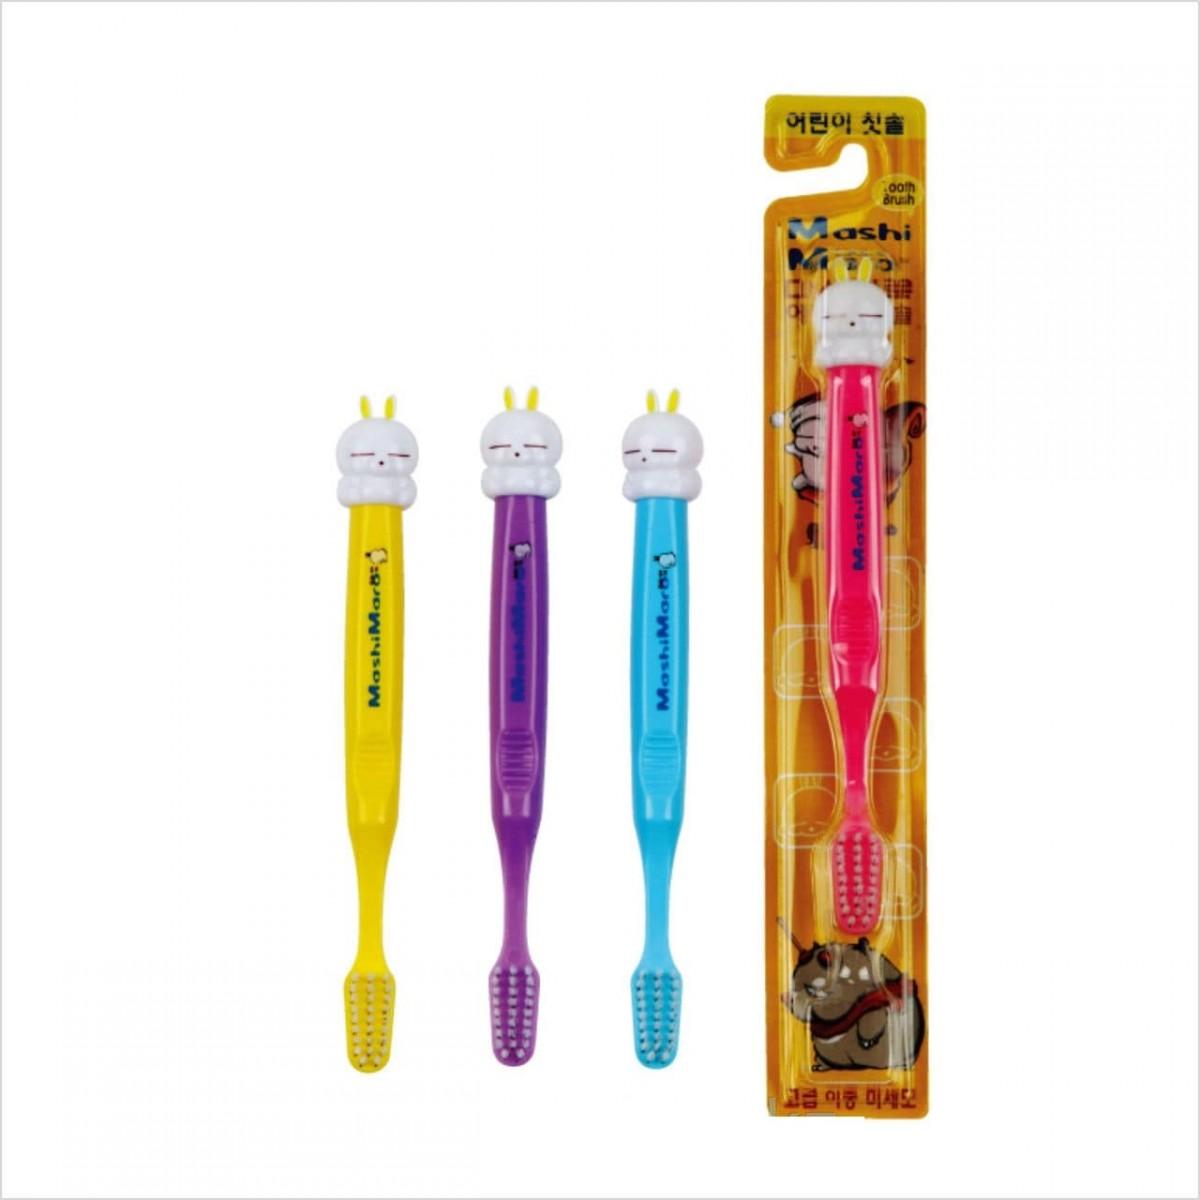 MashiMaro Character Kids Toothbrush